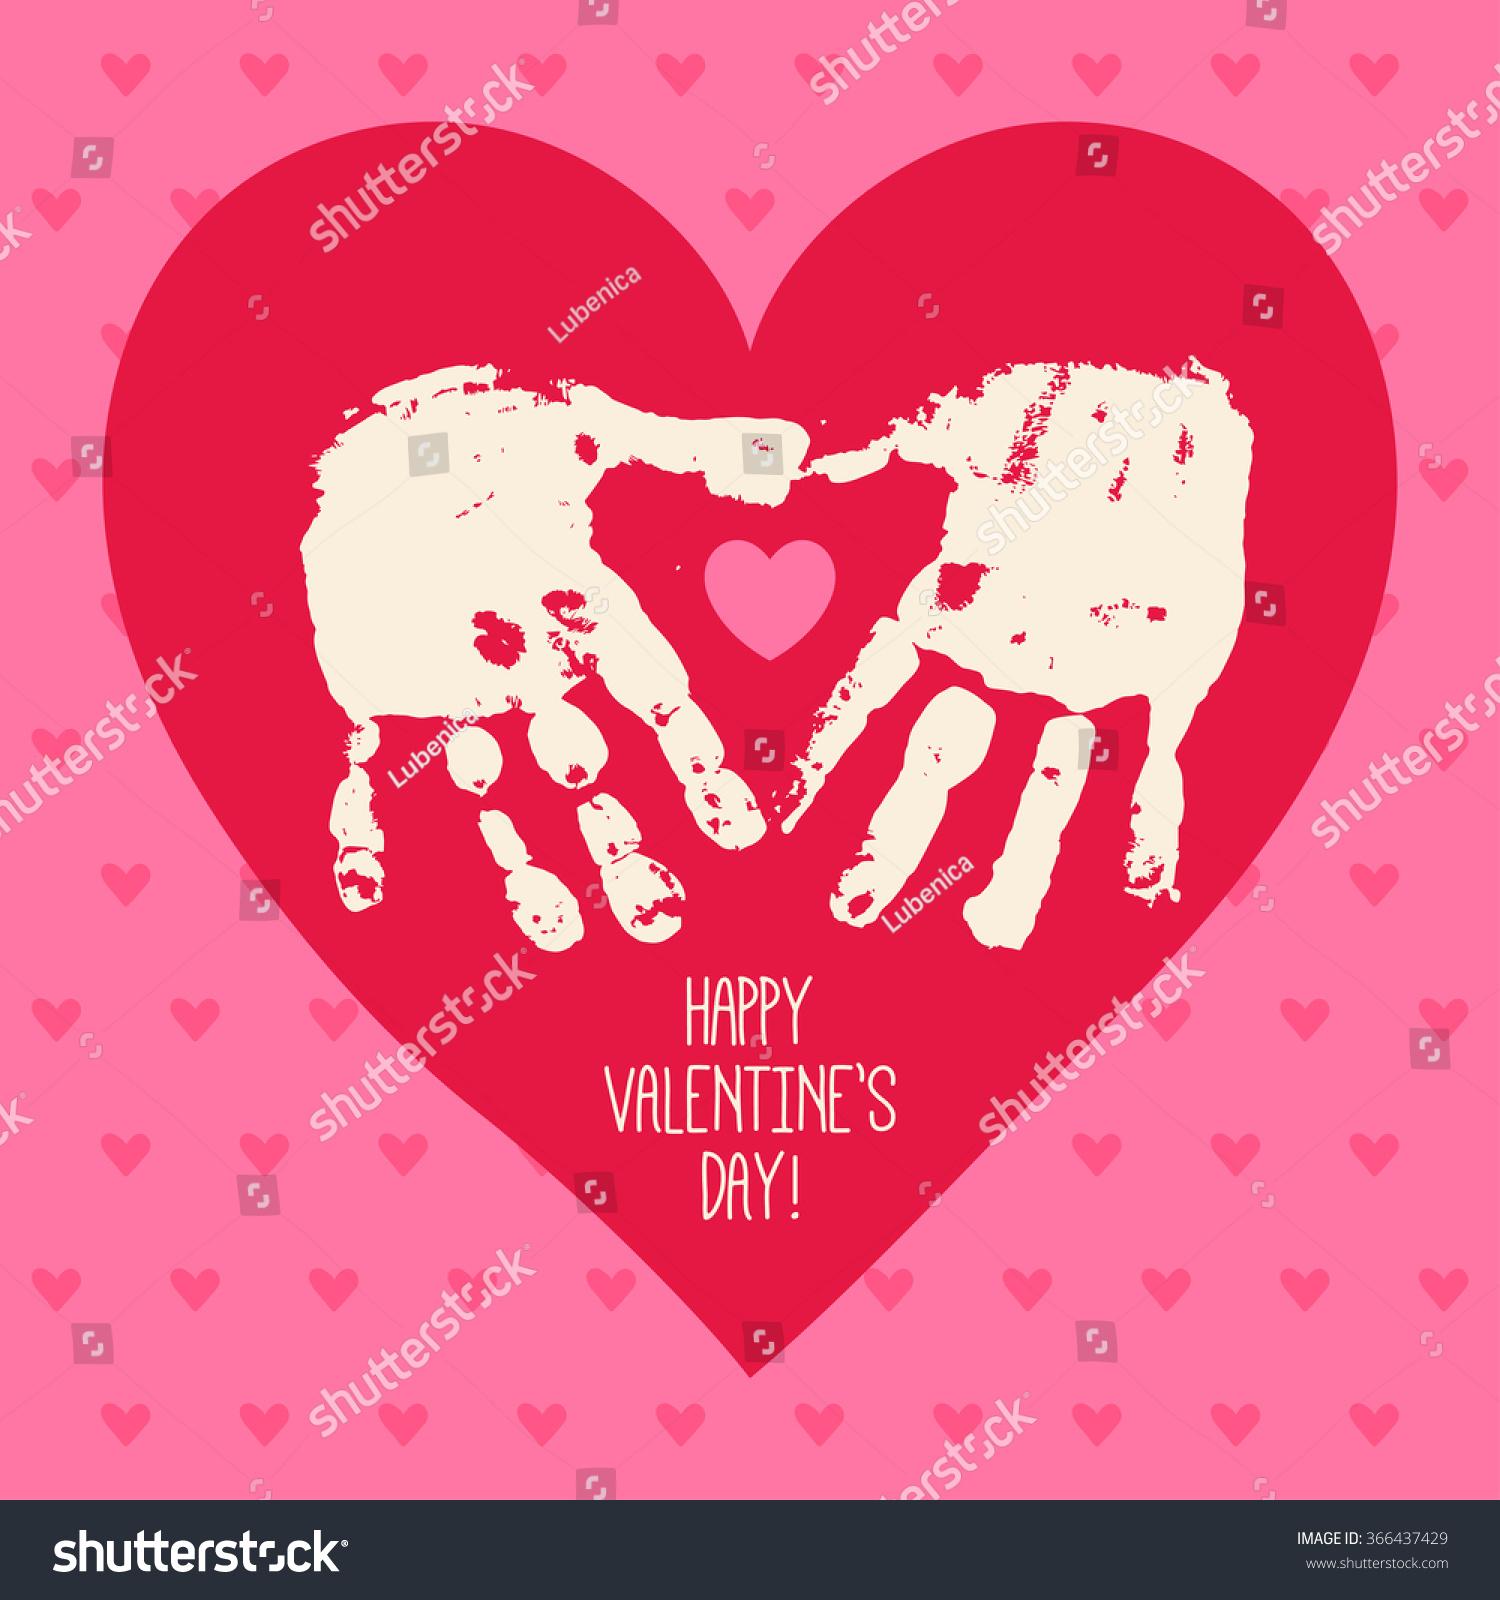 Happy Valentine S Day Card Design With Handprint Heart